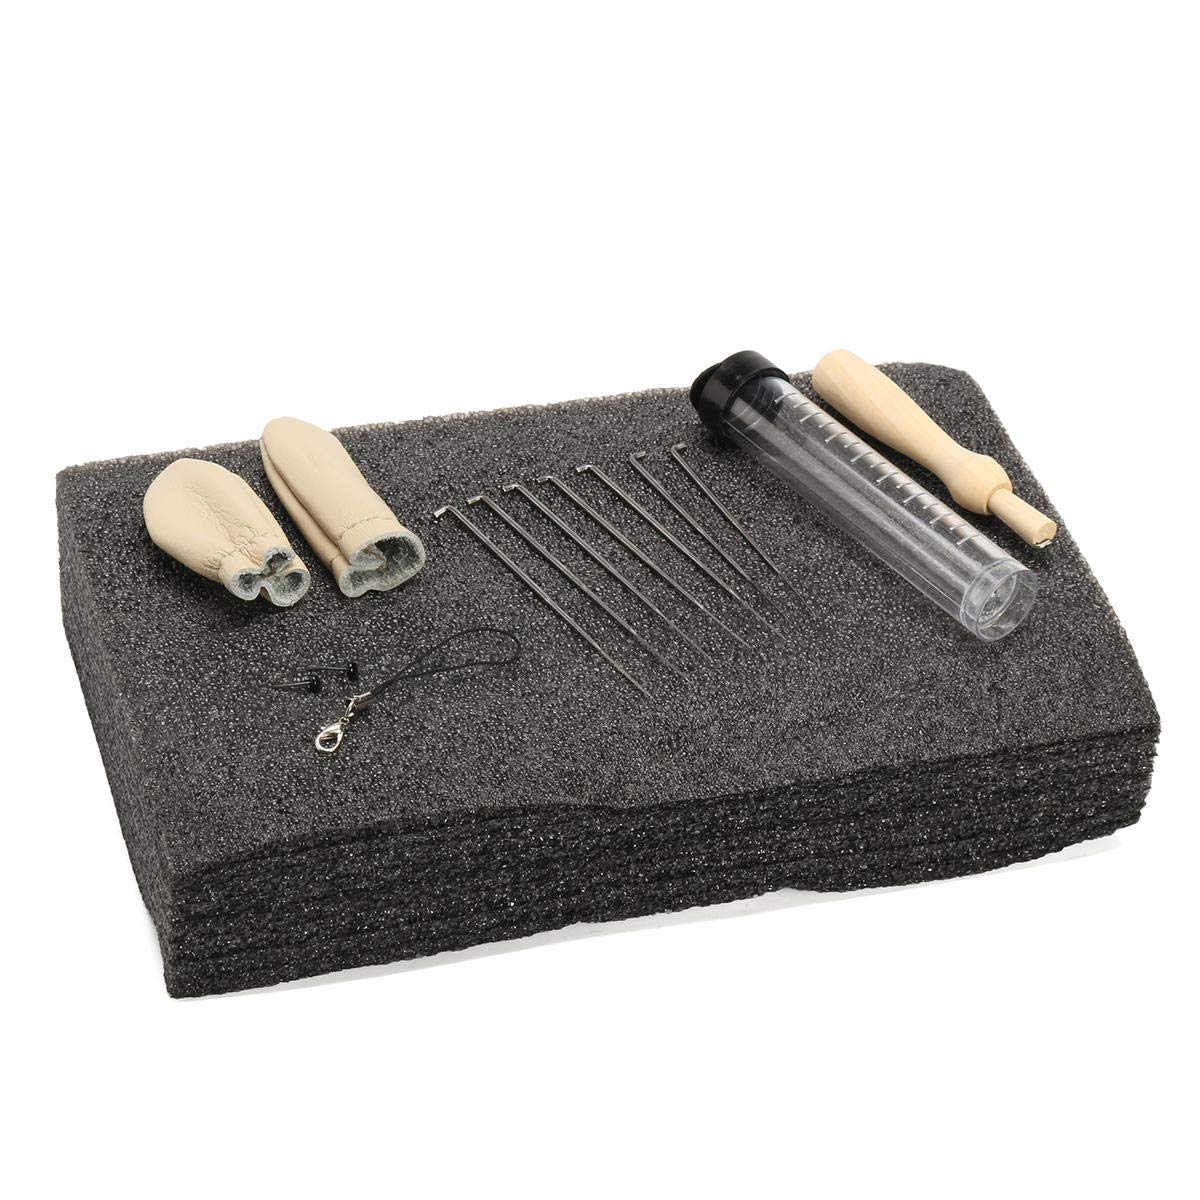 Needles Craft Accessories Set GIlH Needle Felting Foam Starter Kit Wool Felt Tools Mat